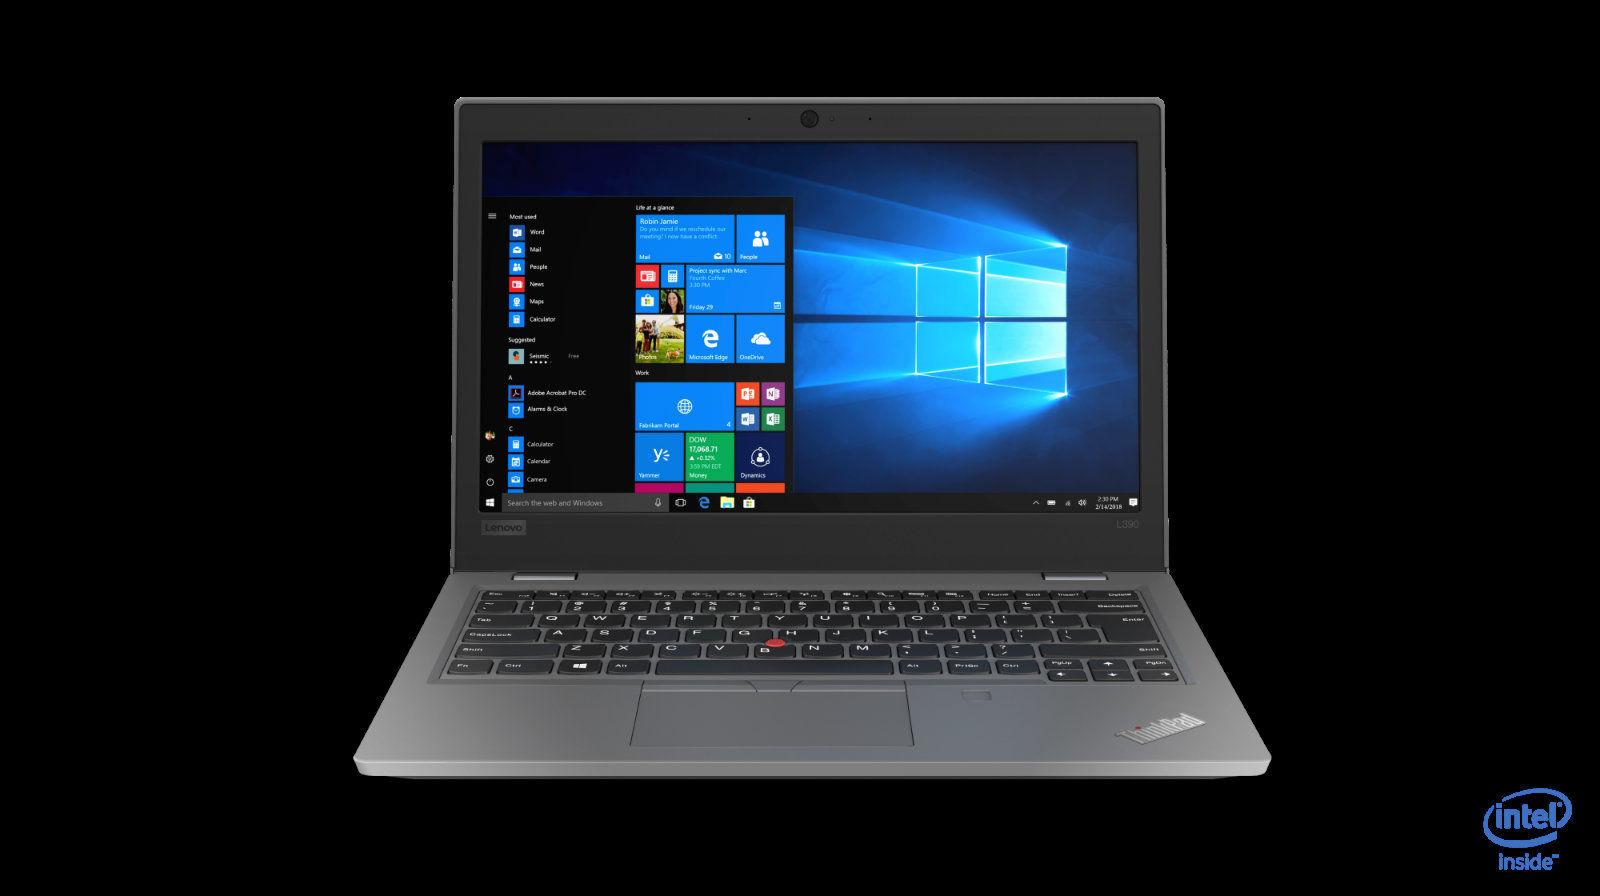 Lenovo ThinkPad L390_L390 Yoga - in text